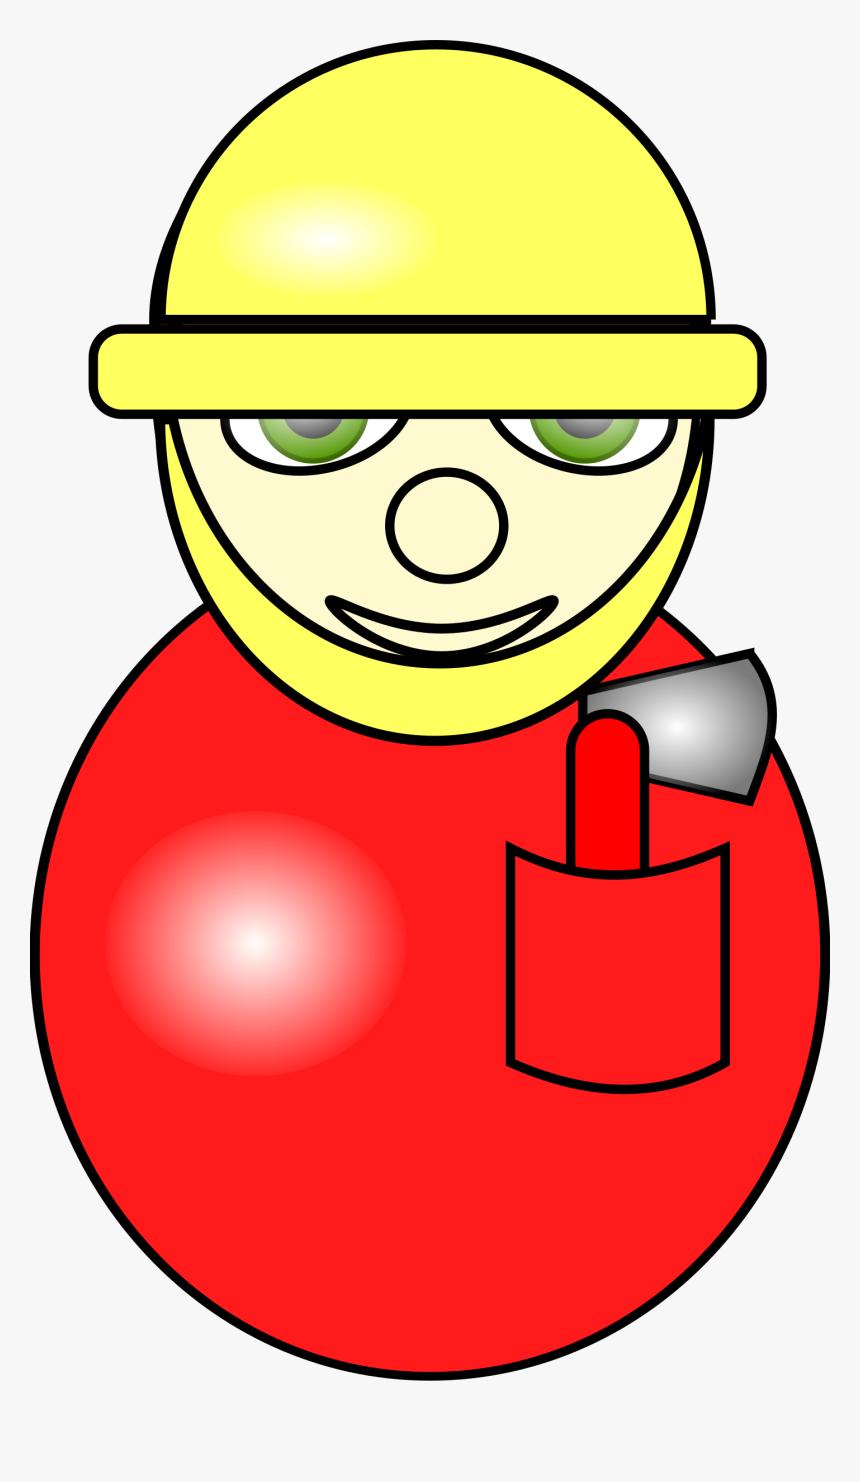 Fireman Avatar Helmet Free Picture - صور كارتون رجل الاطفاء, HD Png Download, Free Download